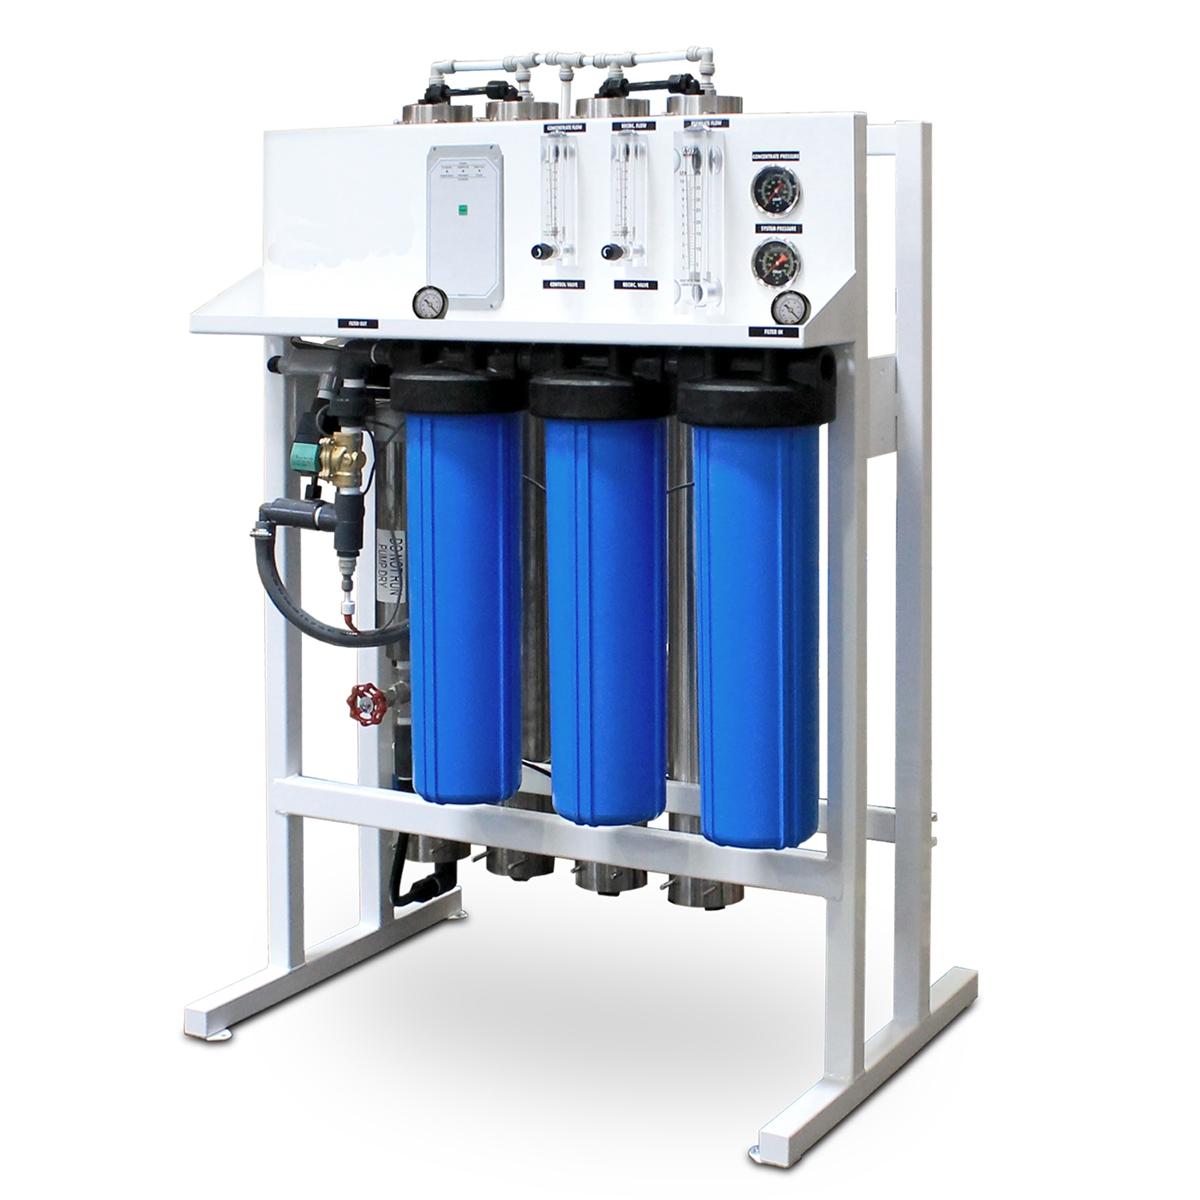 Fpcro 4000 M 4000 Gpd Reverse Osmosis System